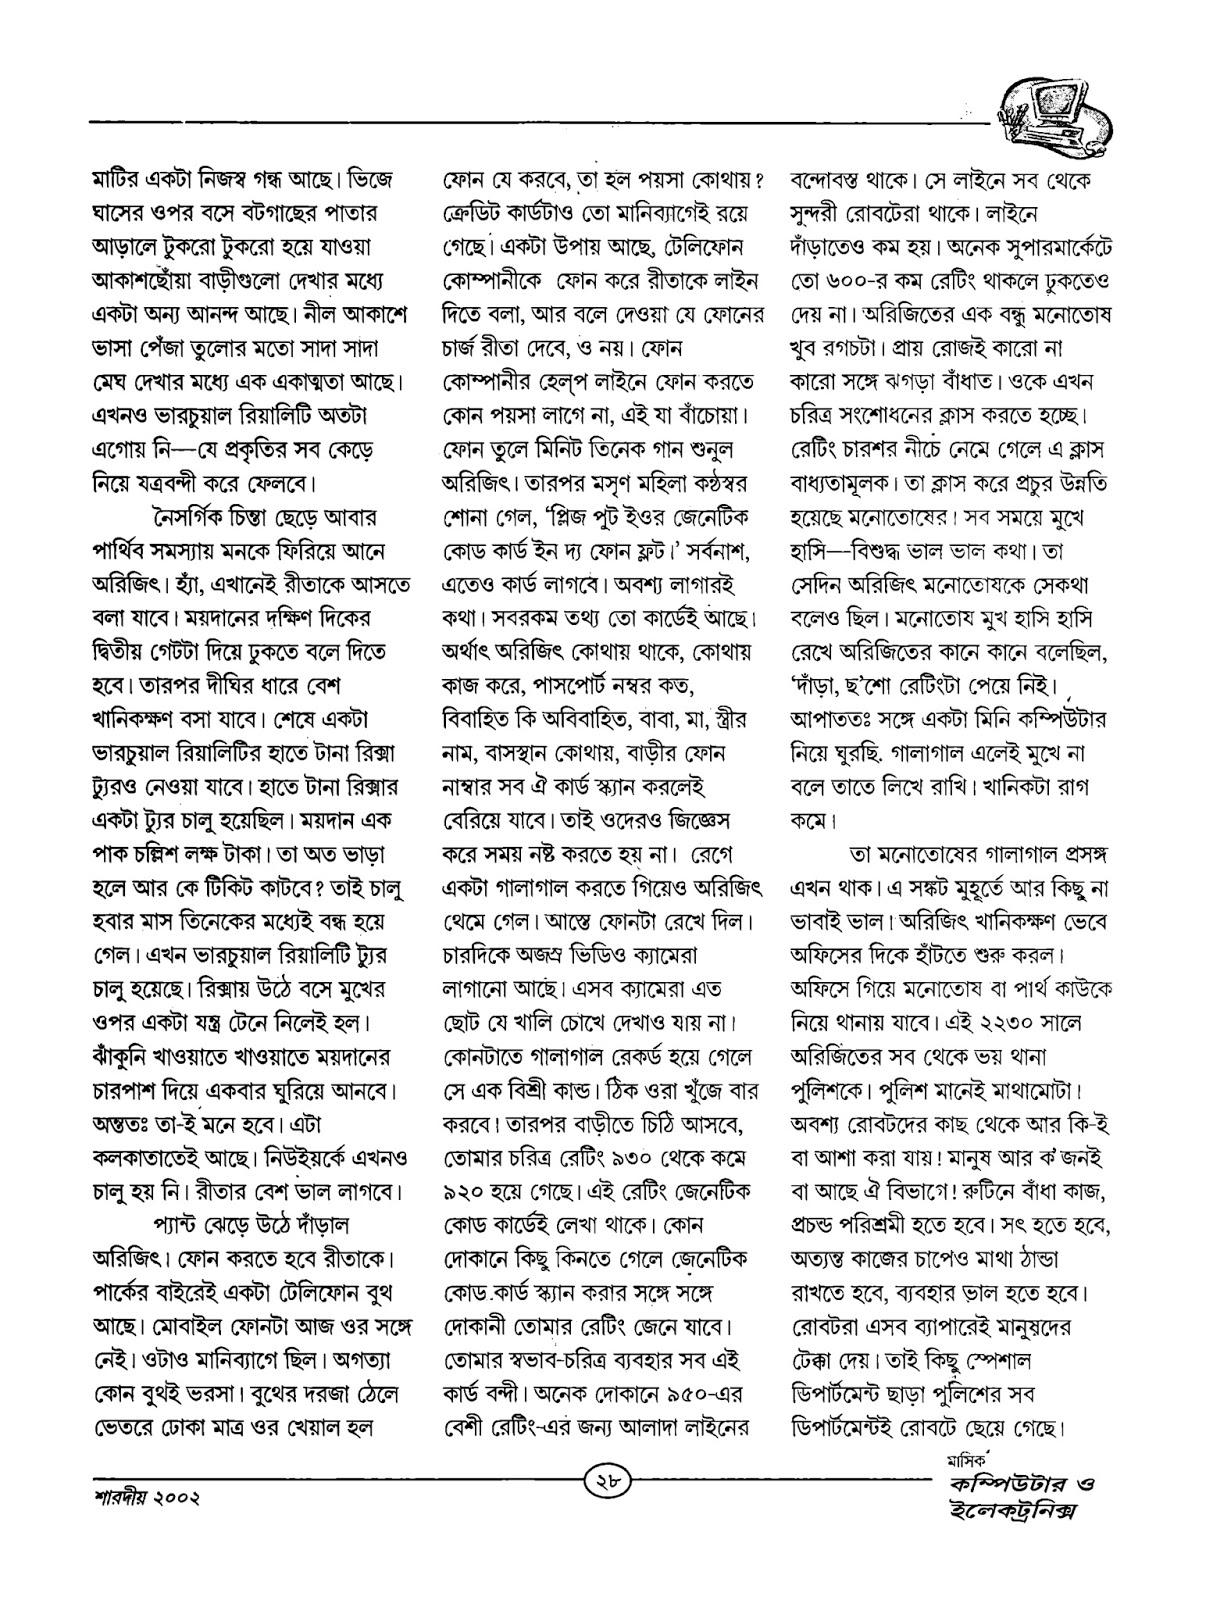 theme of shakuntala story